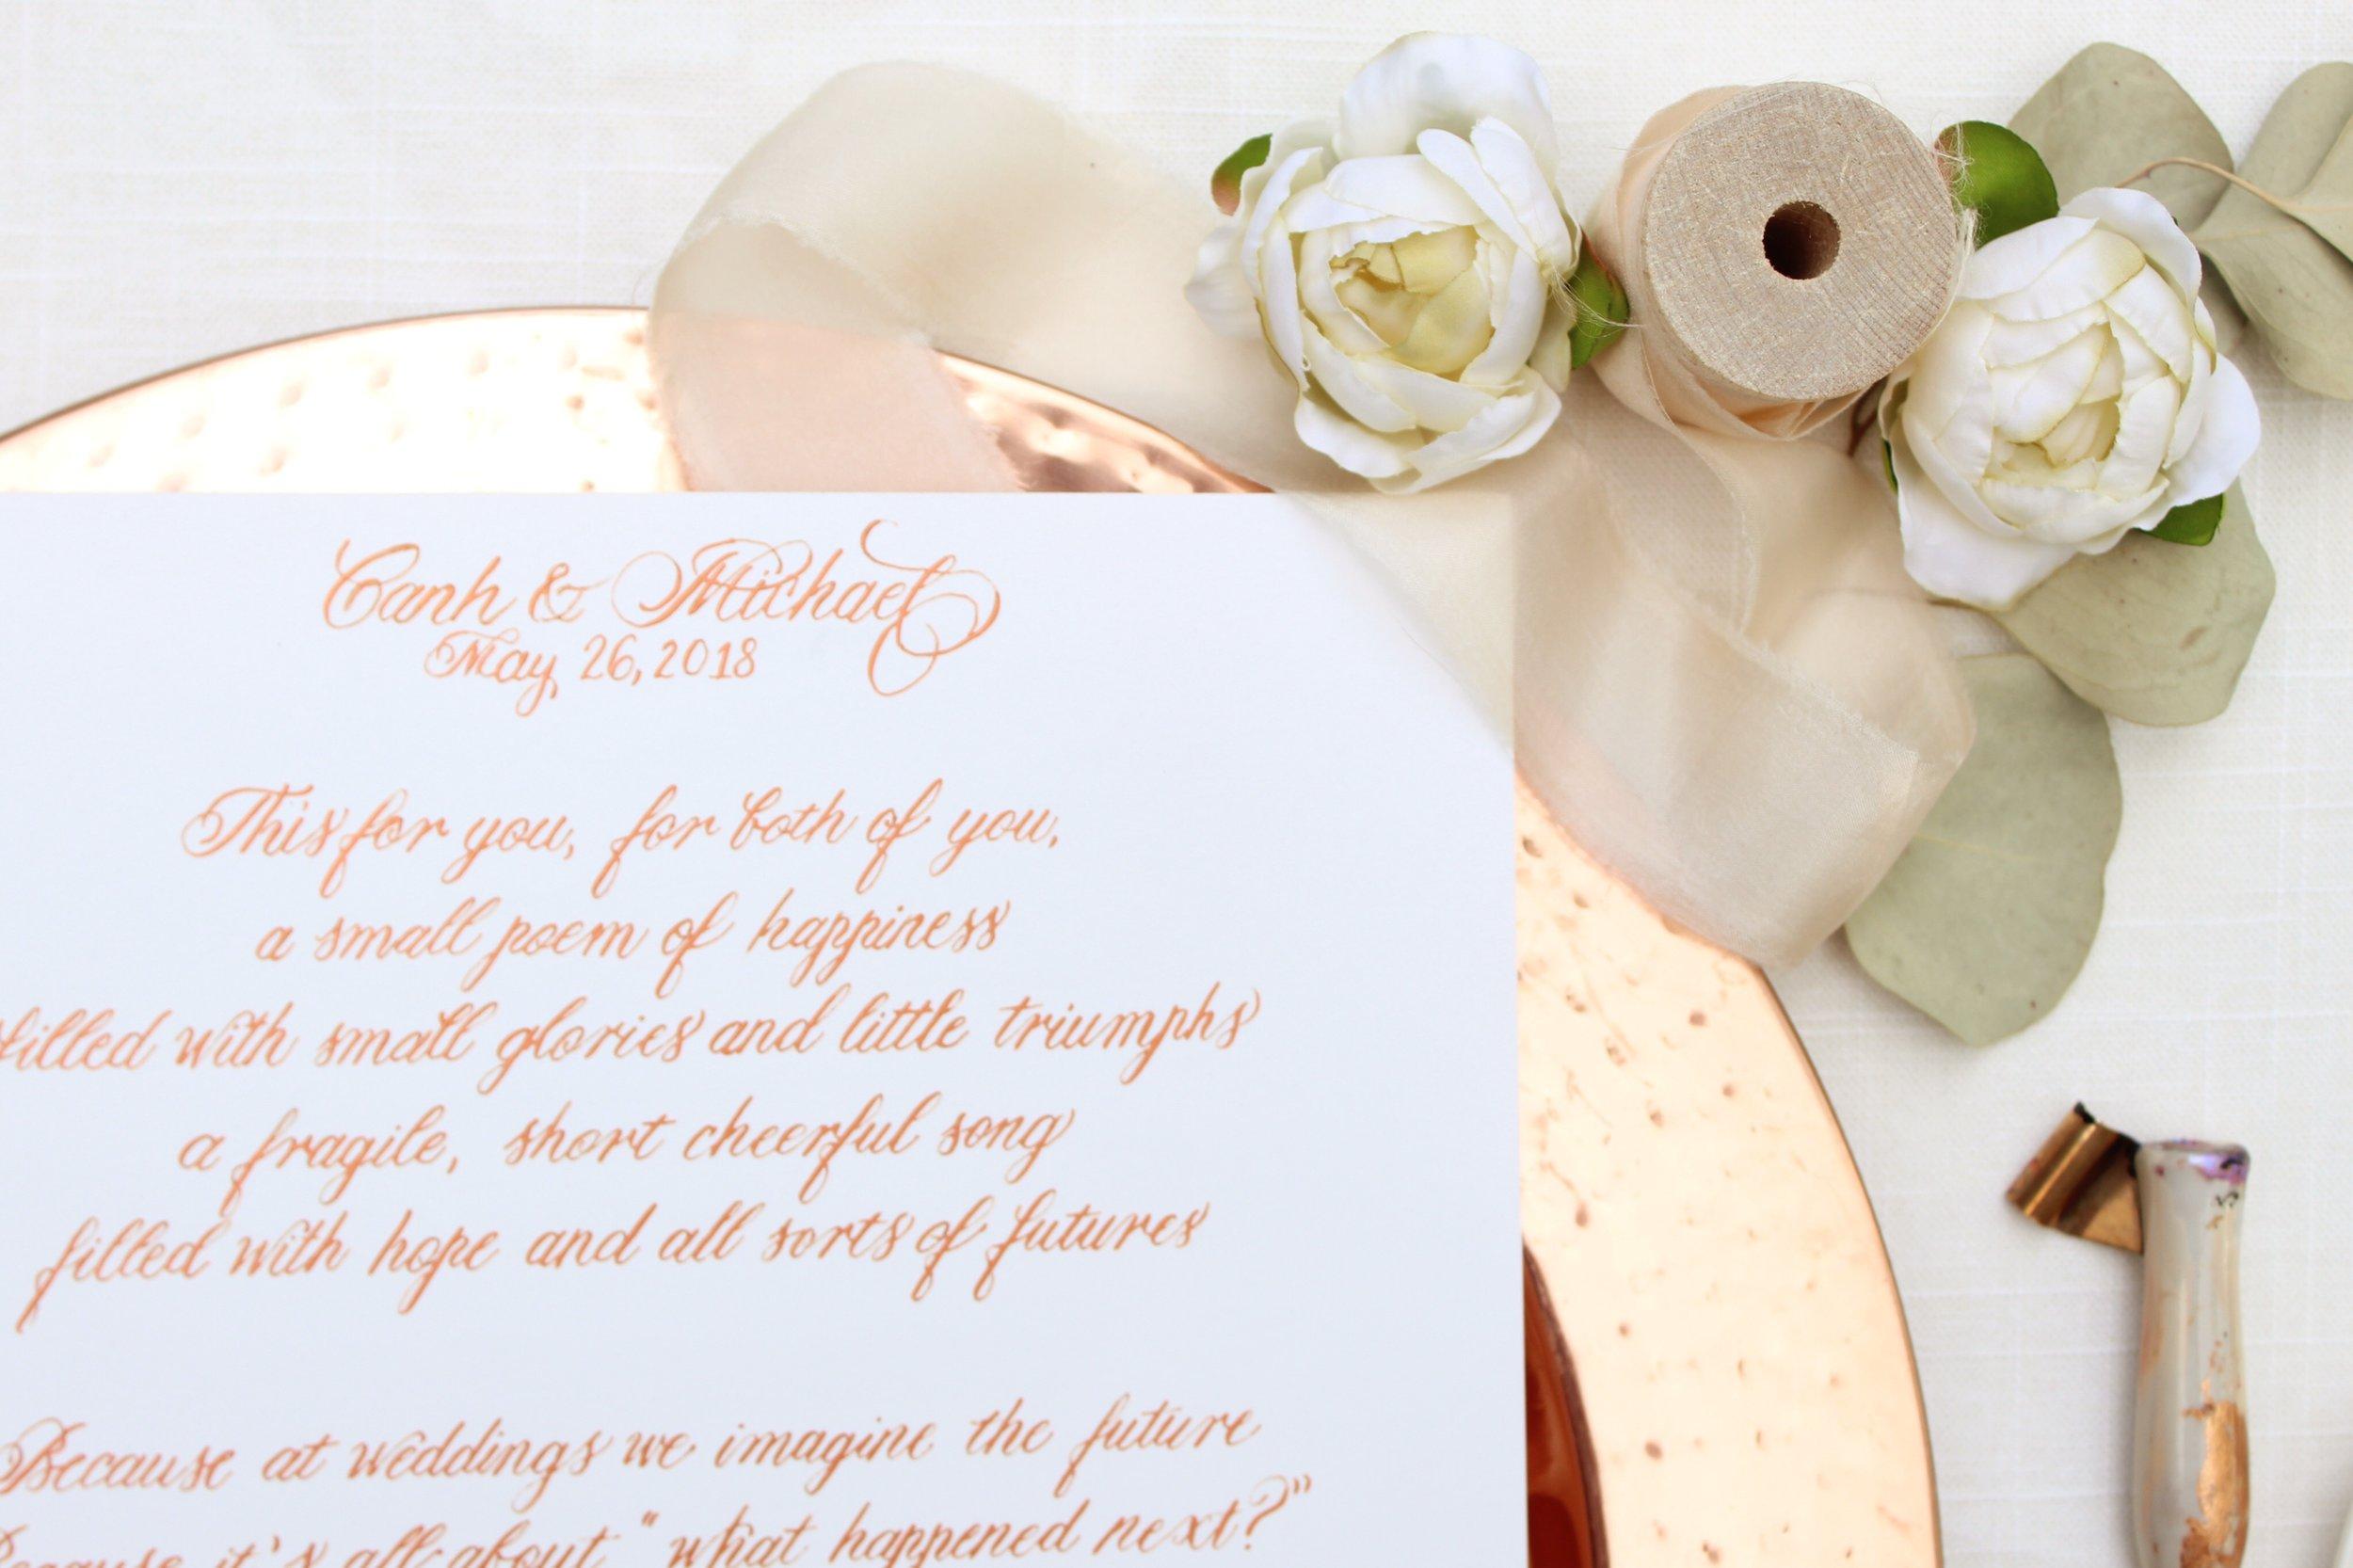 Central PA, York PA, JesSmith Designs, custom, wedding, invitations, bridal, announcements, save the date, baby, hanover, calligraphy, baltimore, wedding invitations, lancaster, gettysburg-05-11 19.14.54.jpg